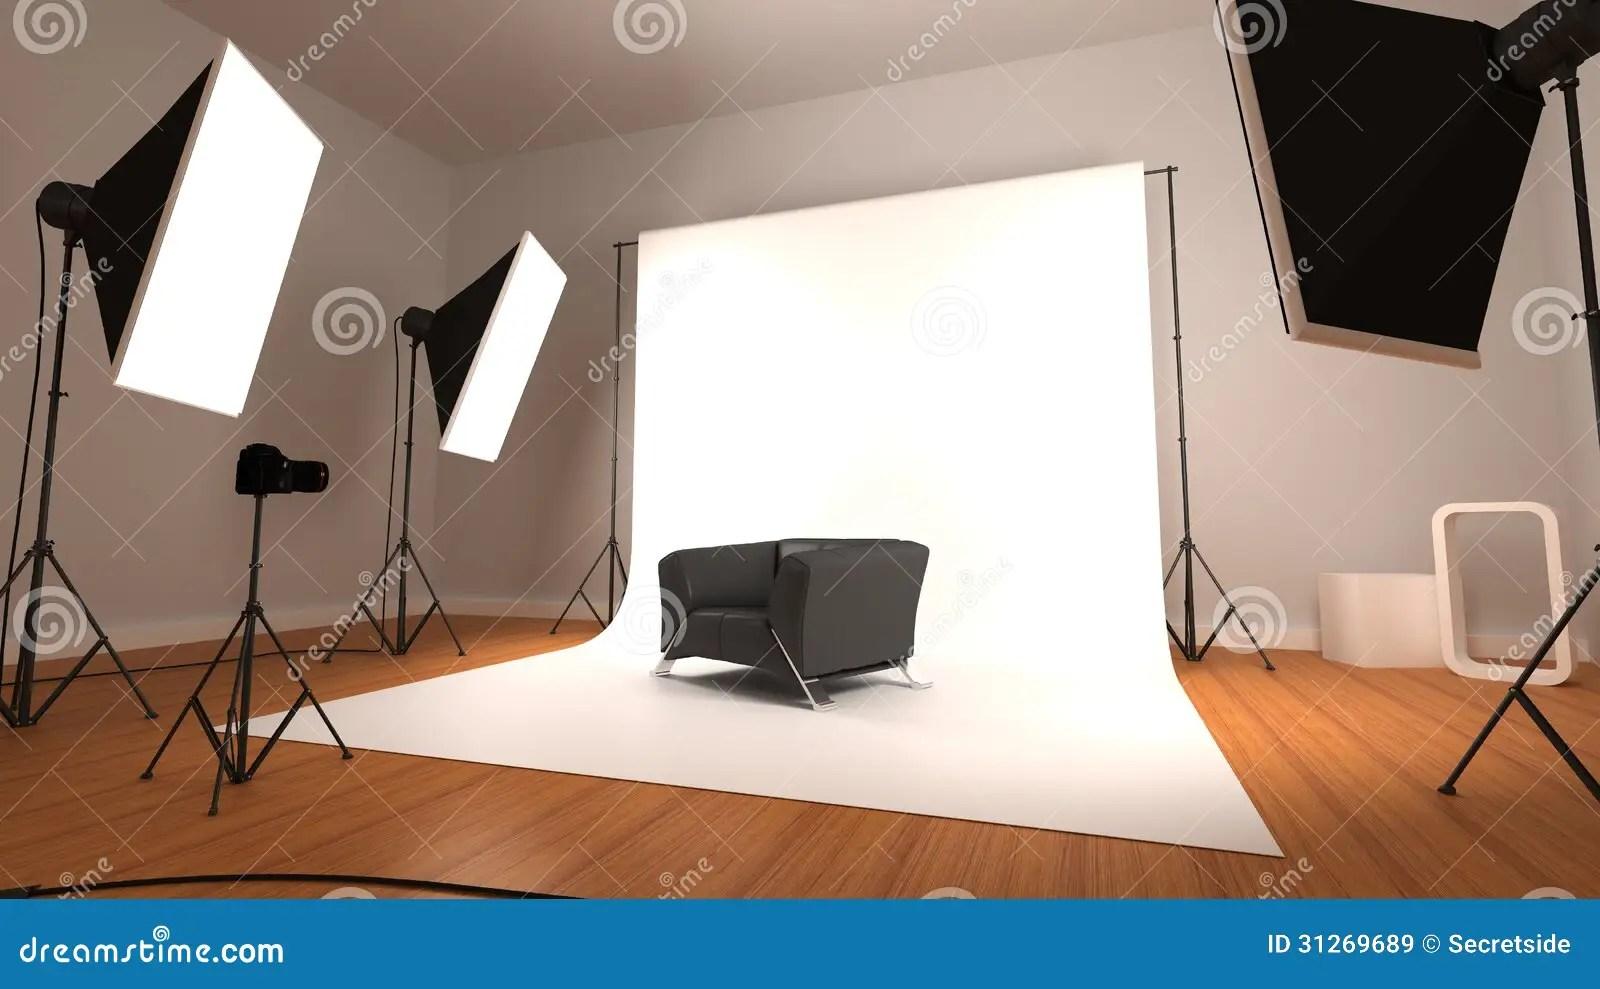 Camera Studio Lights